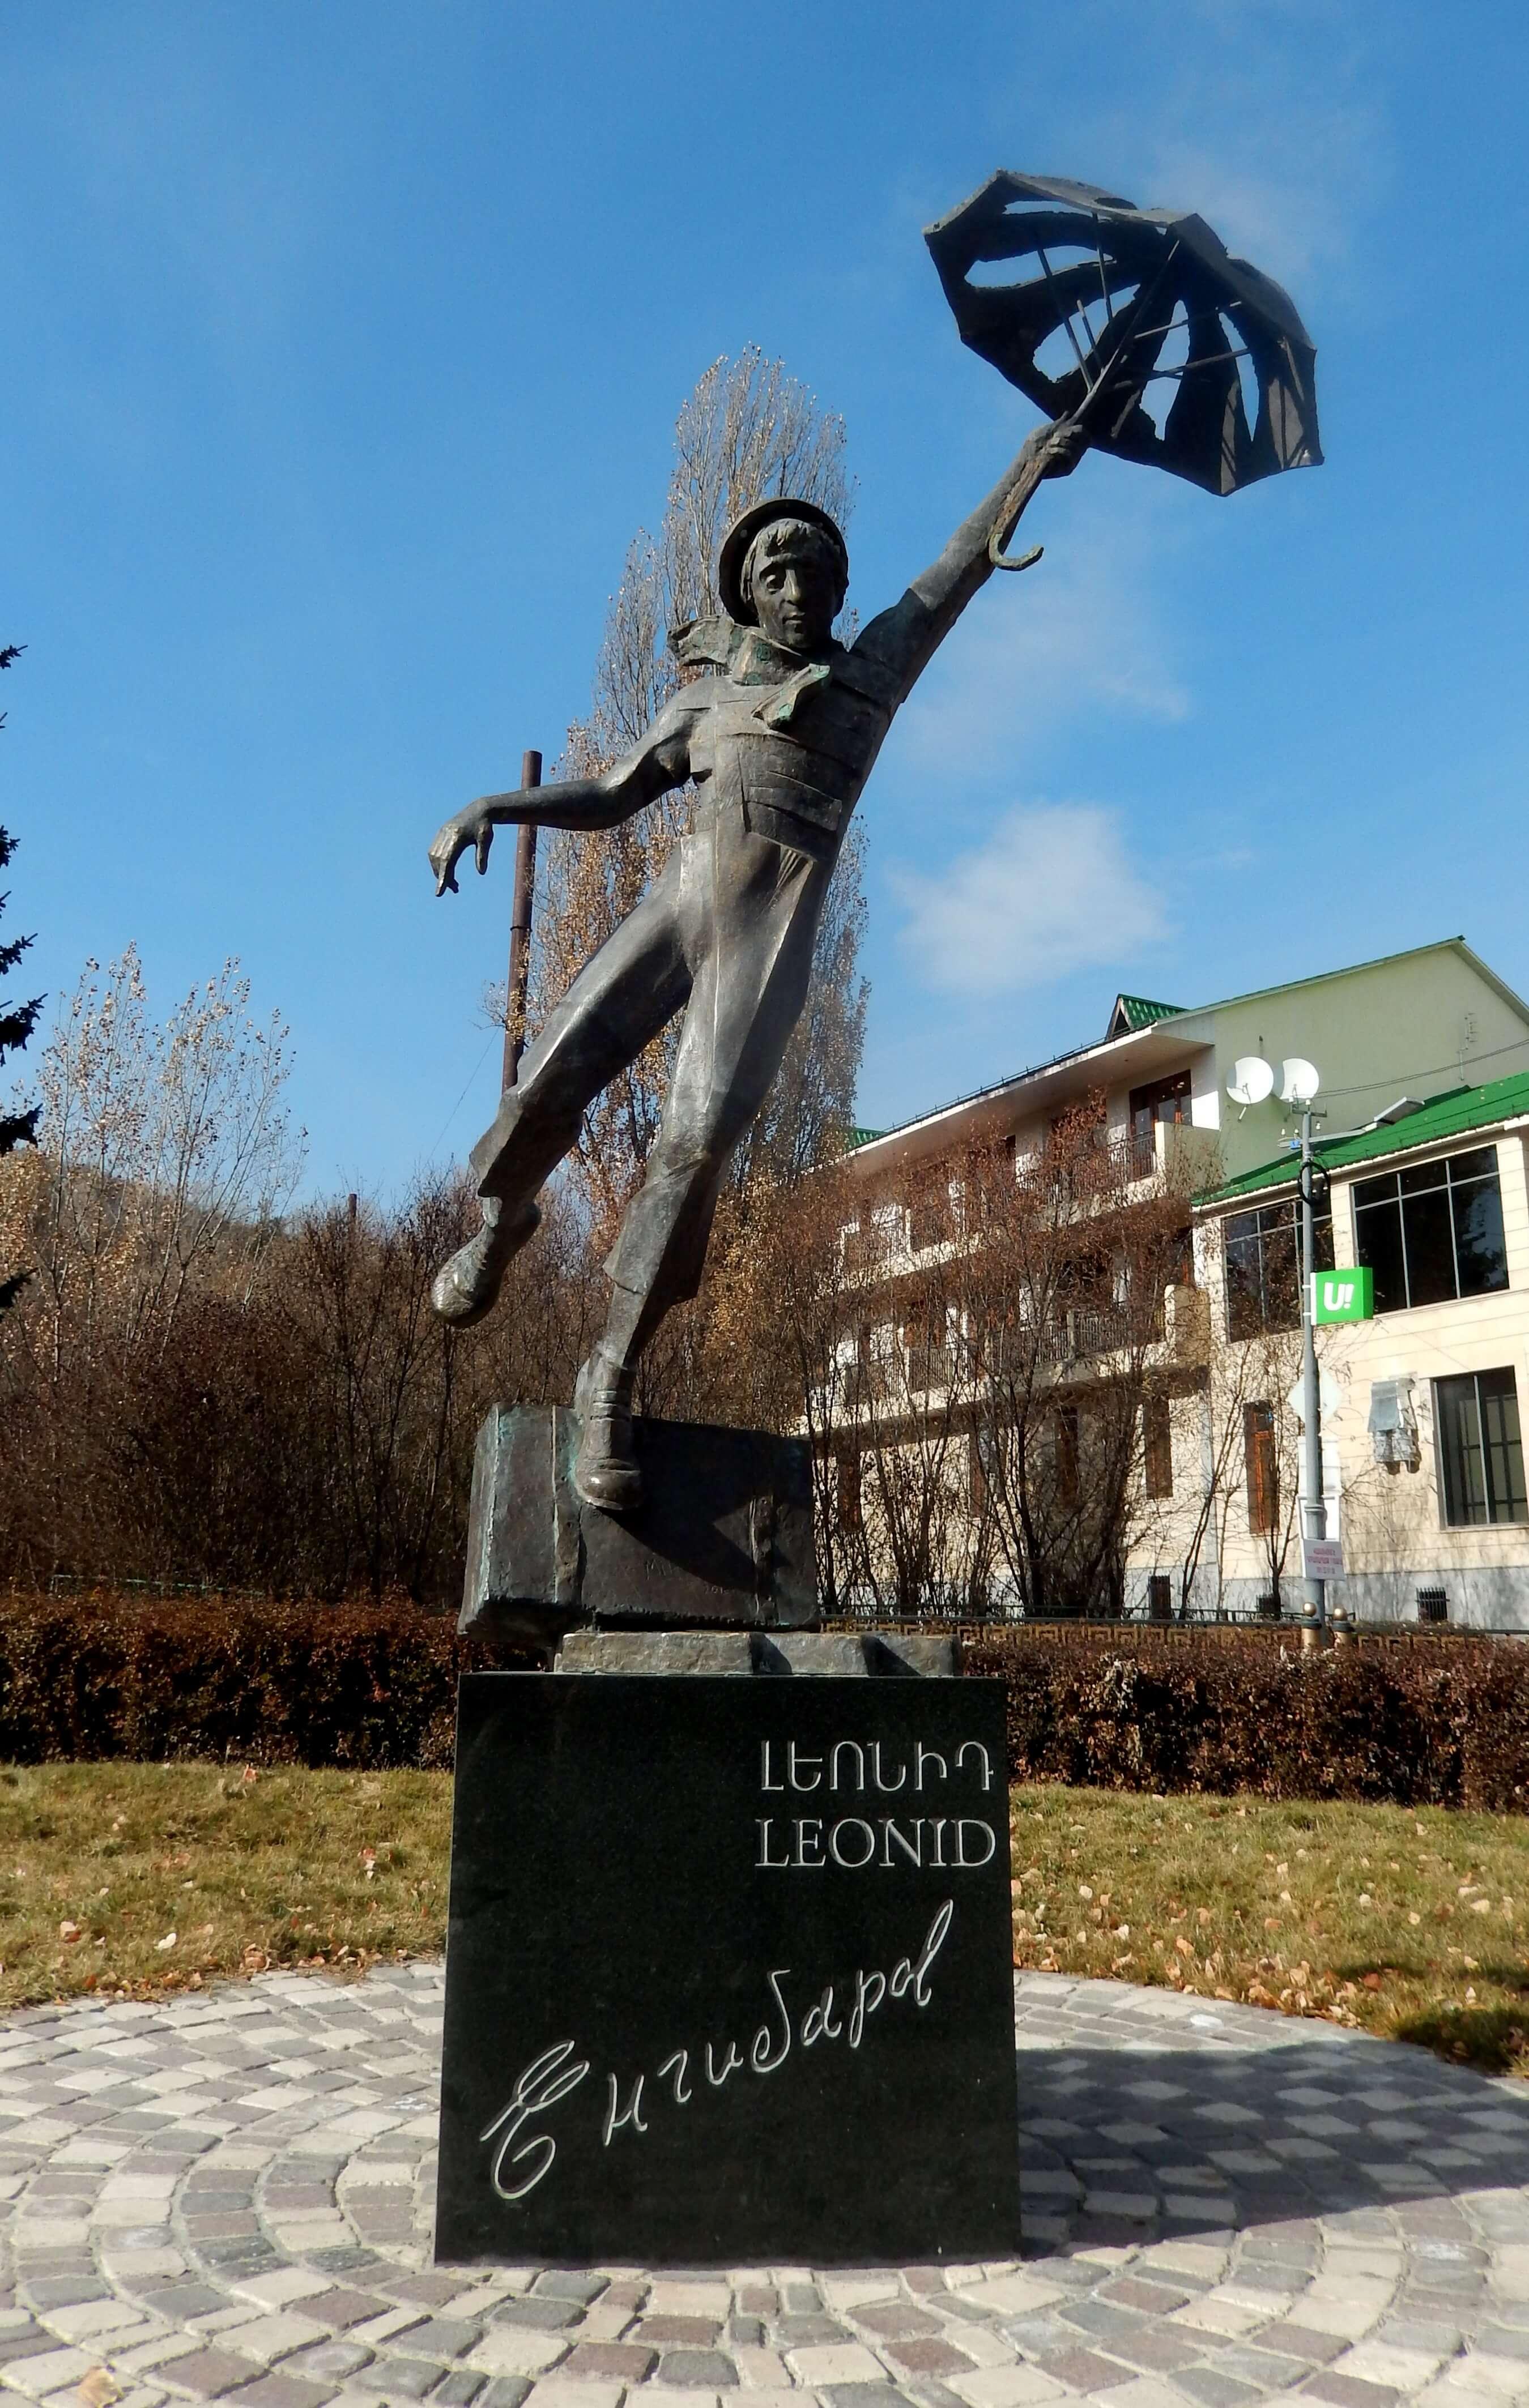 A monument of Leonid Yengibaryan in the Tsaghkunyats square, Tsaghkadzor